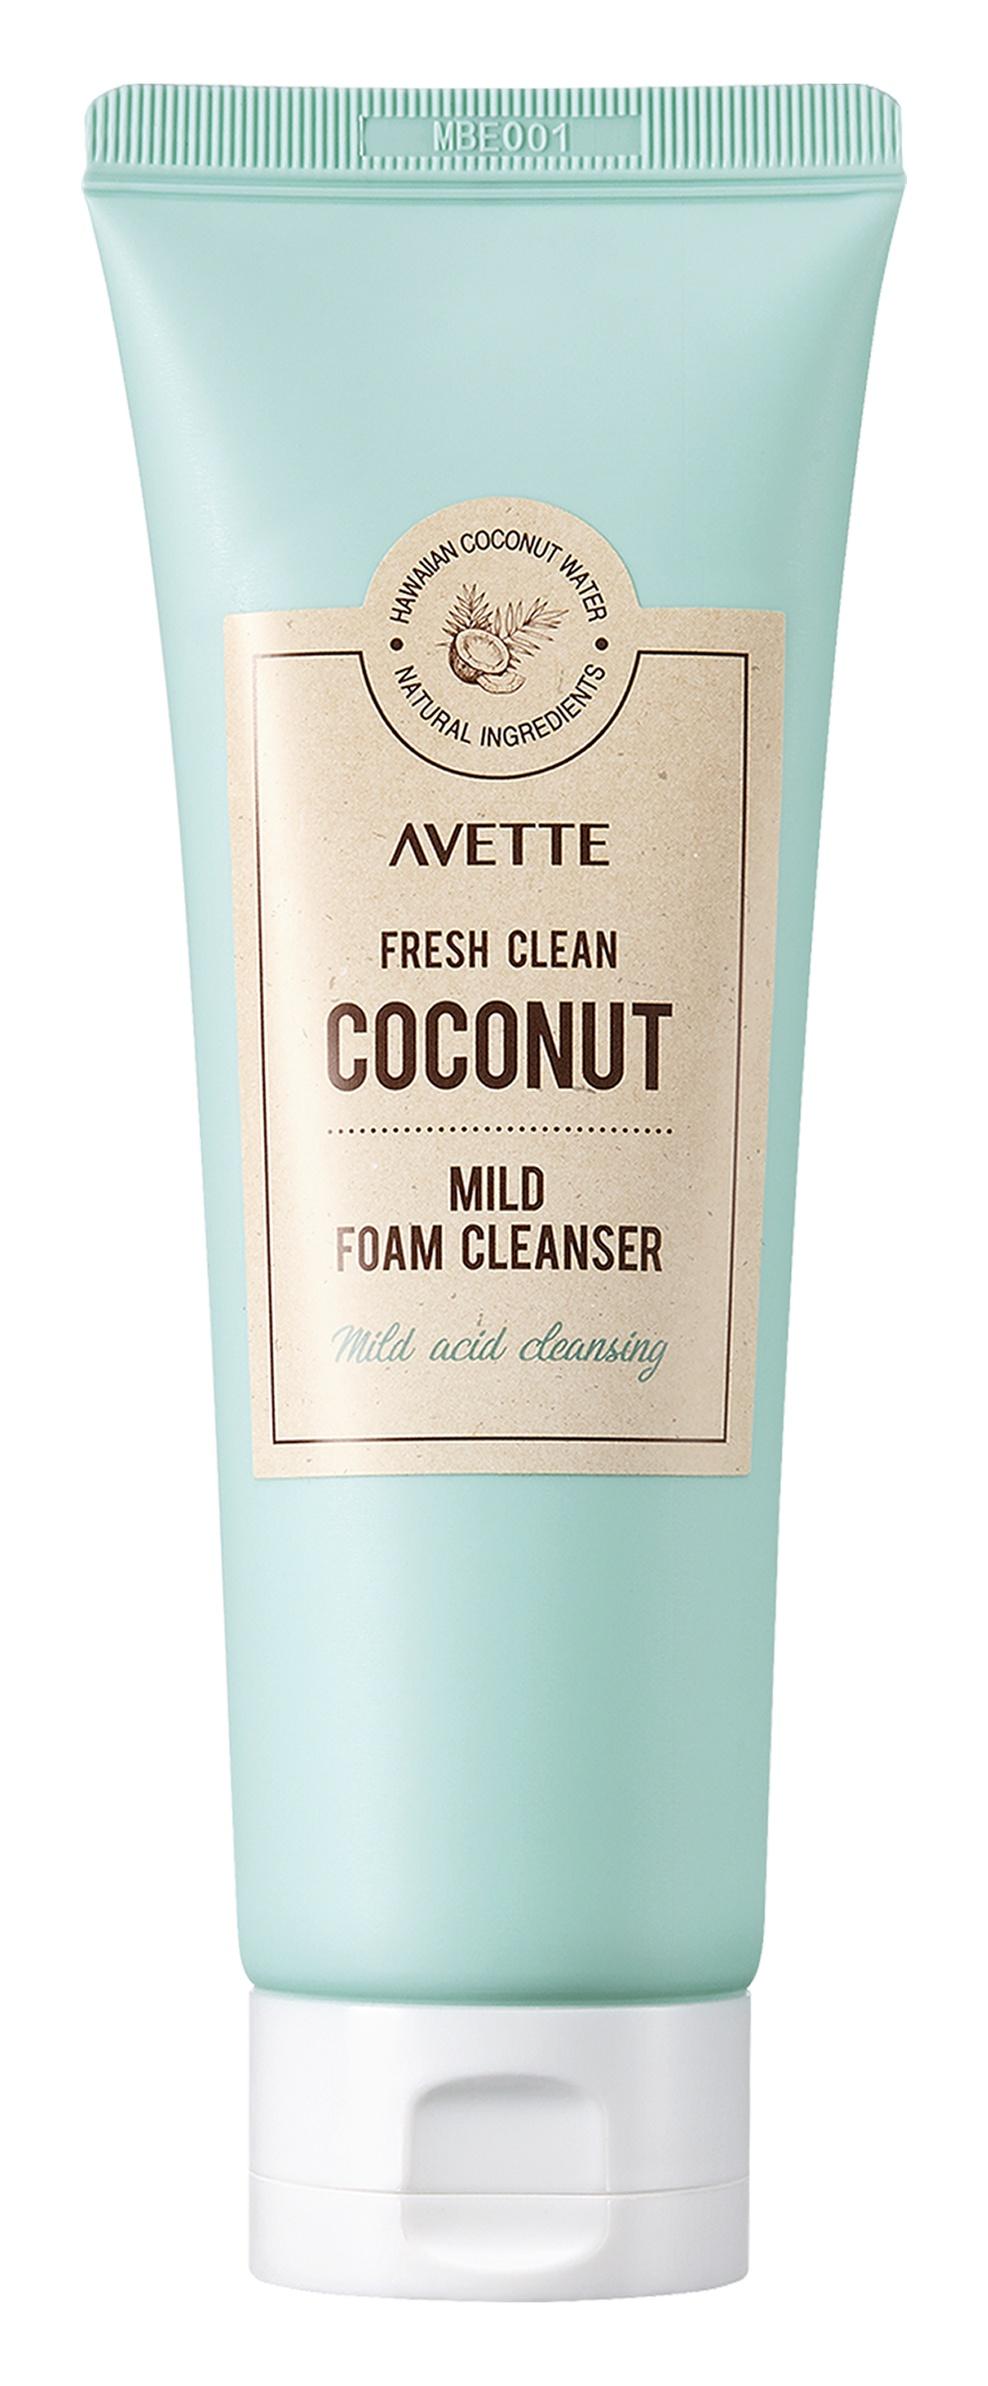 Avette Fresh Clean Coconut Mild Foam Cleanser